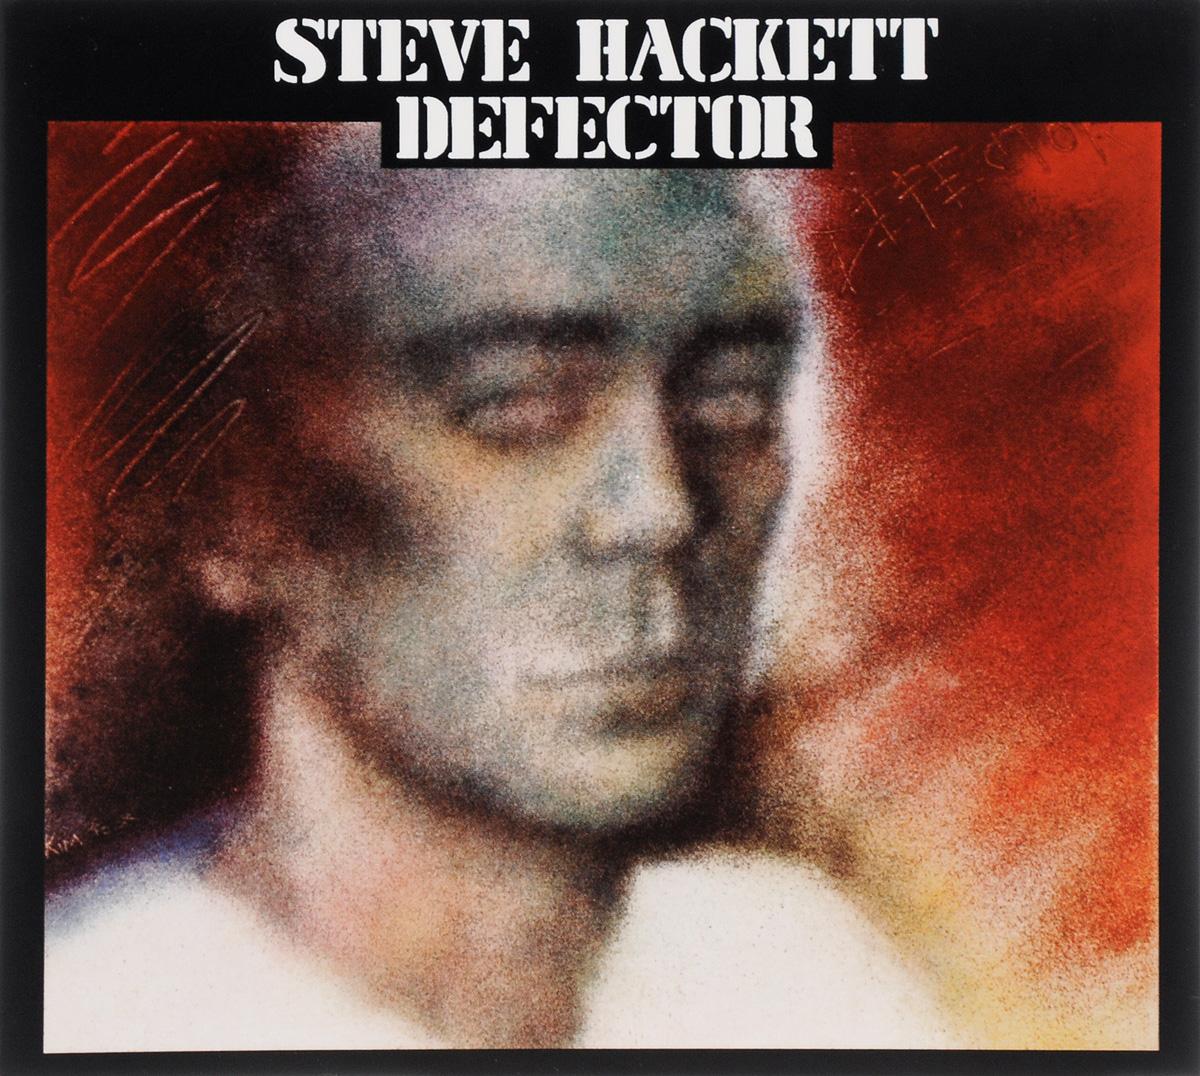 Стив Хэкетт Steve Hackett. Defector (2 CD + DVD) the vamps the vamps wake up